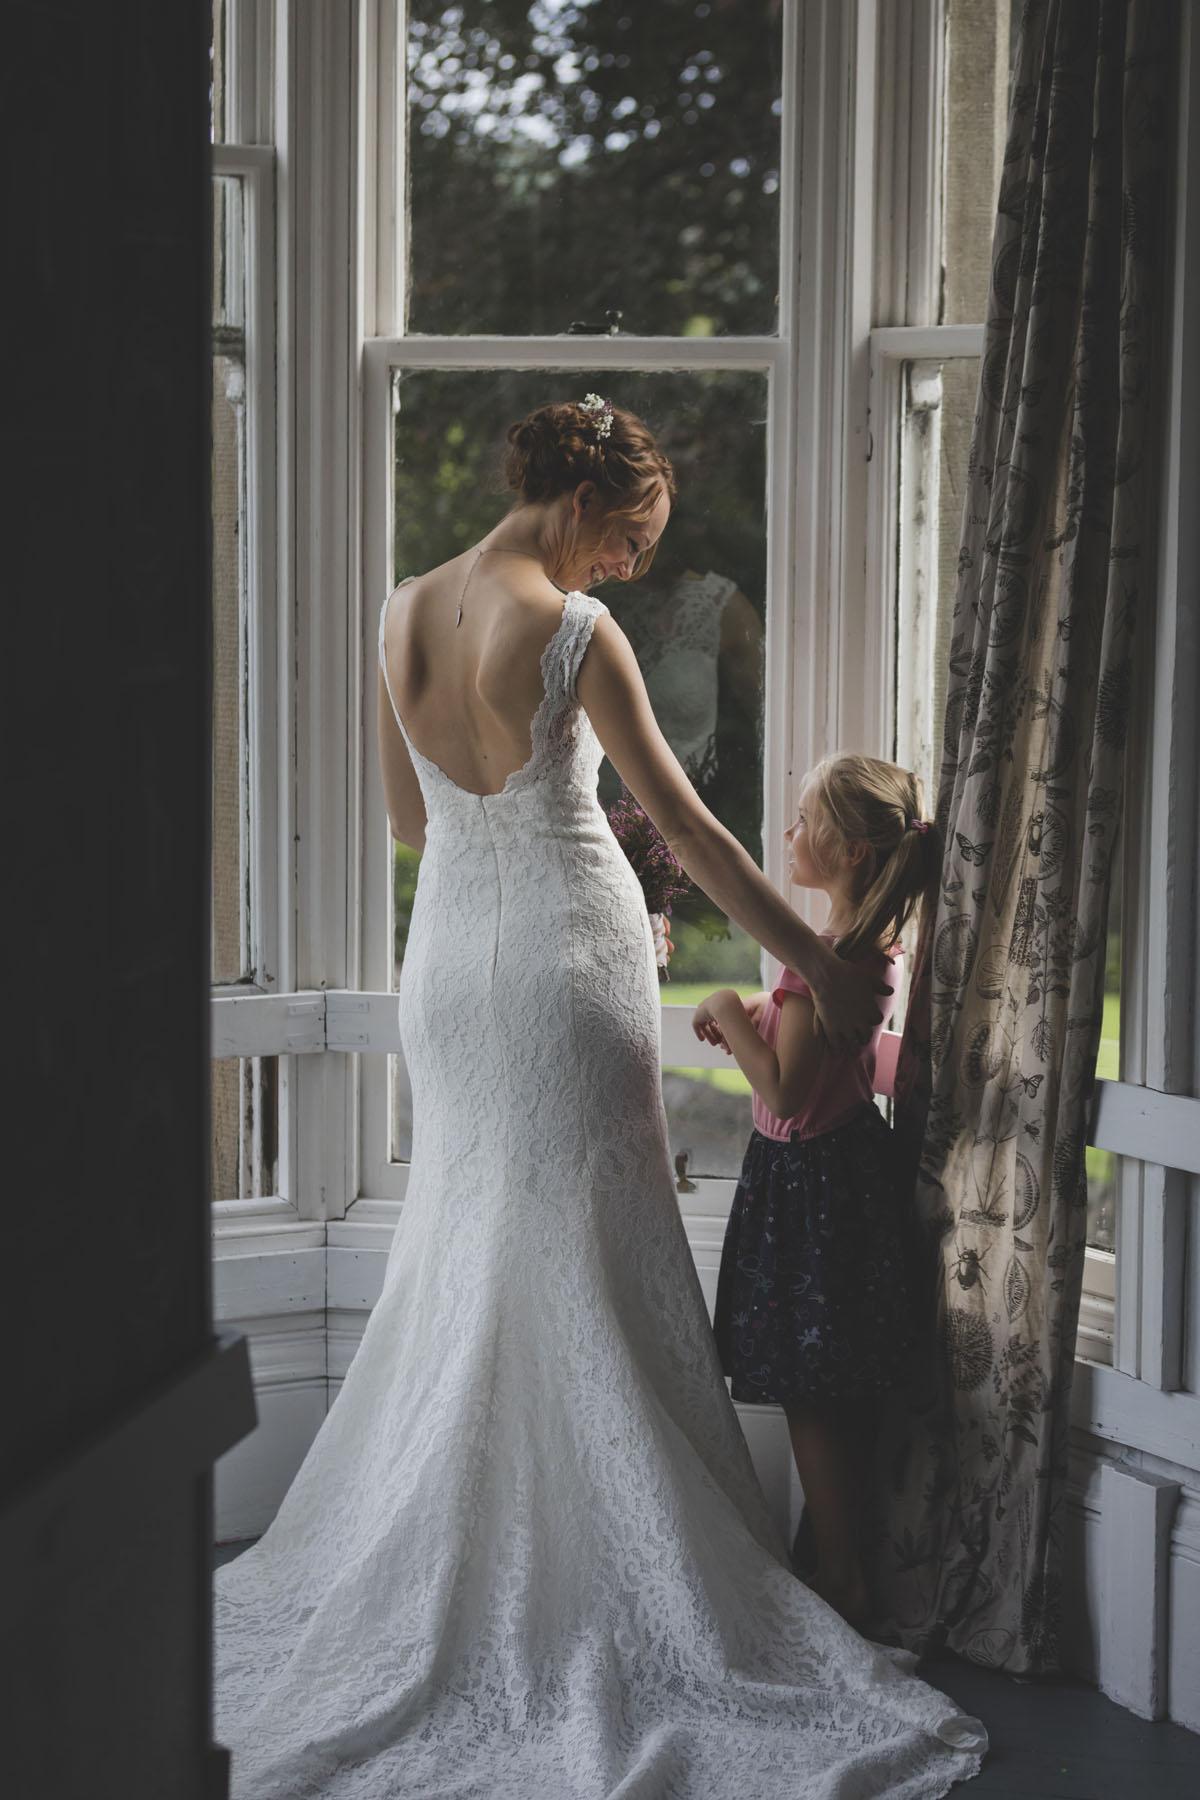 pulmafotod-050-scotland-wedding-photo.jpg